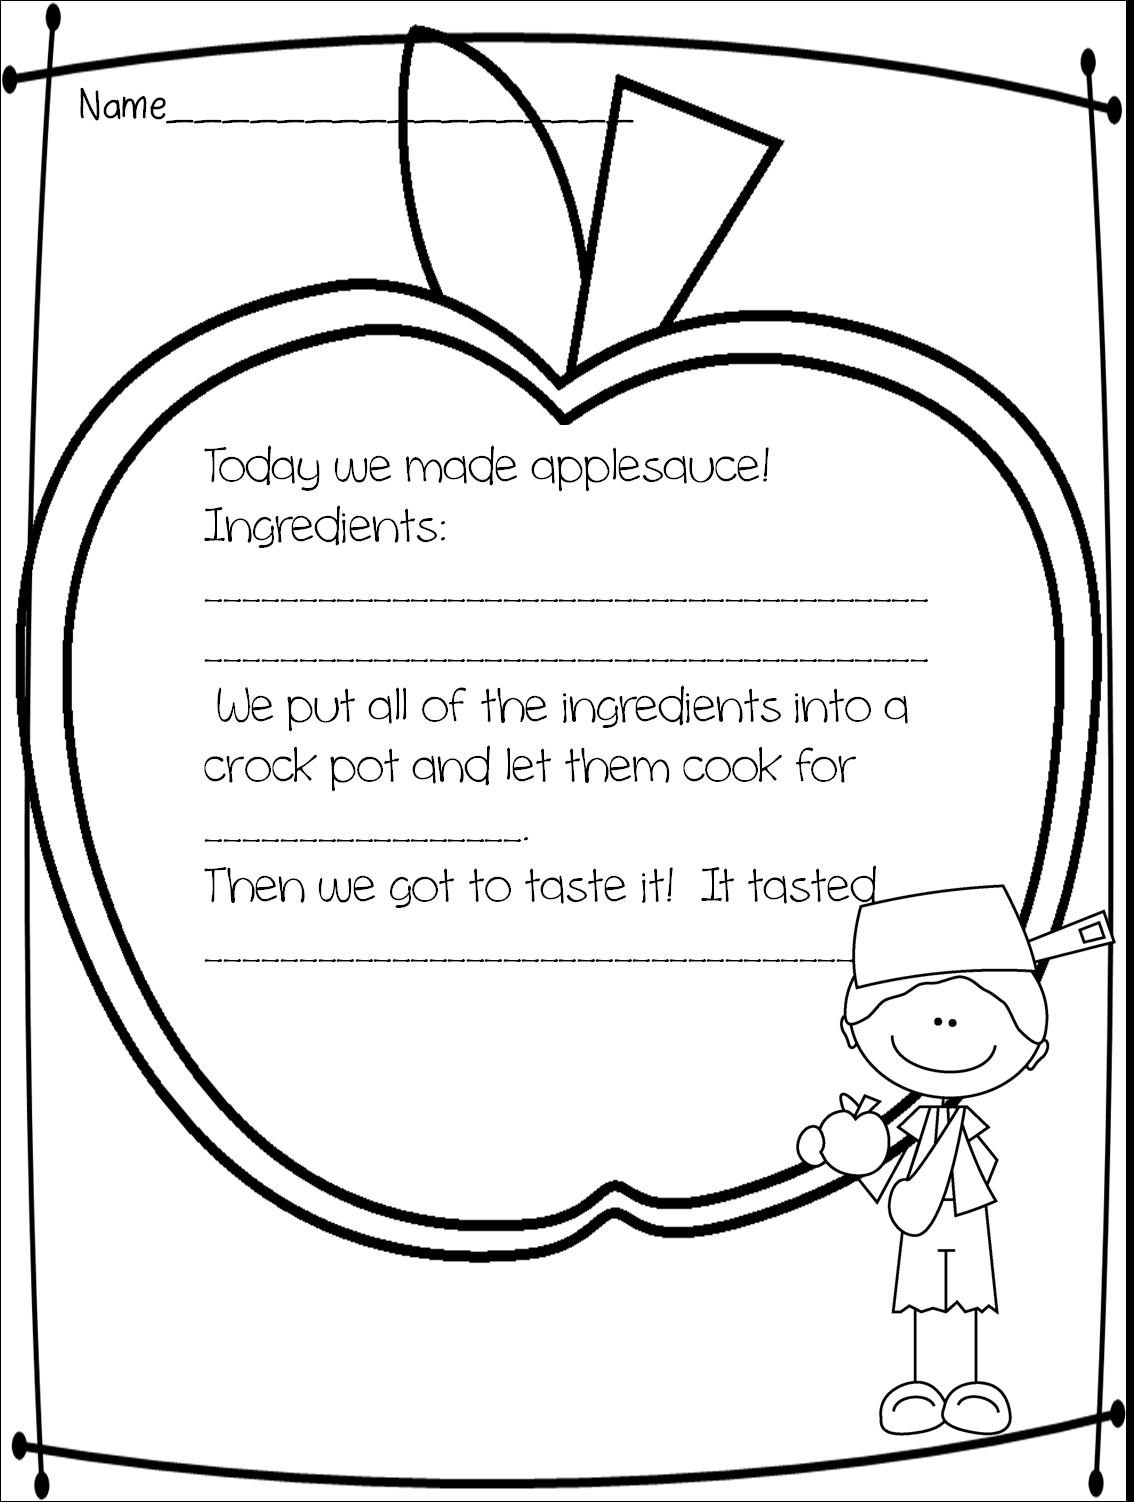 Johnny Appleseed Applesauce Recipe 1 134 1 502